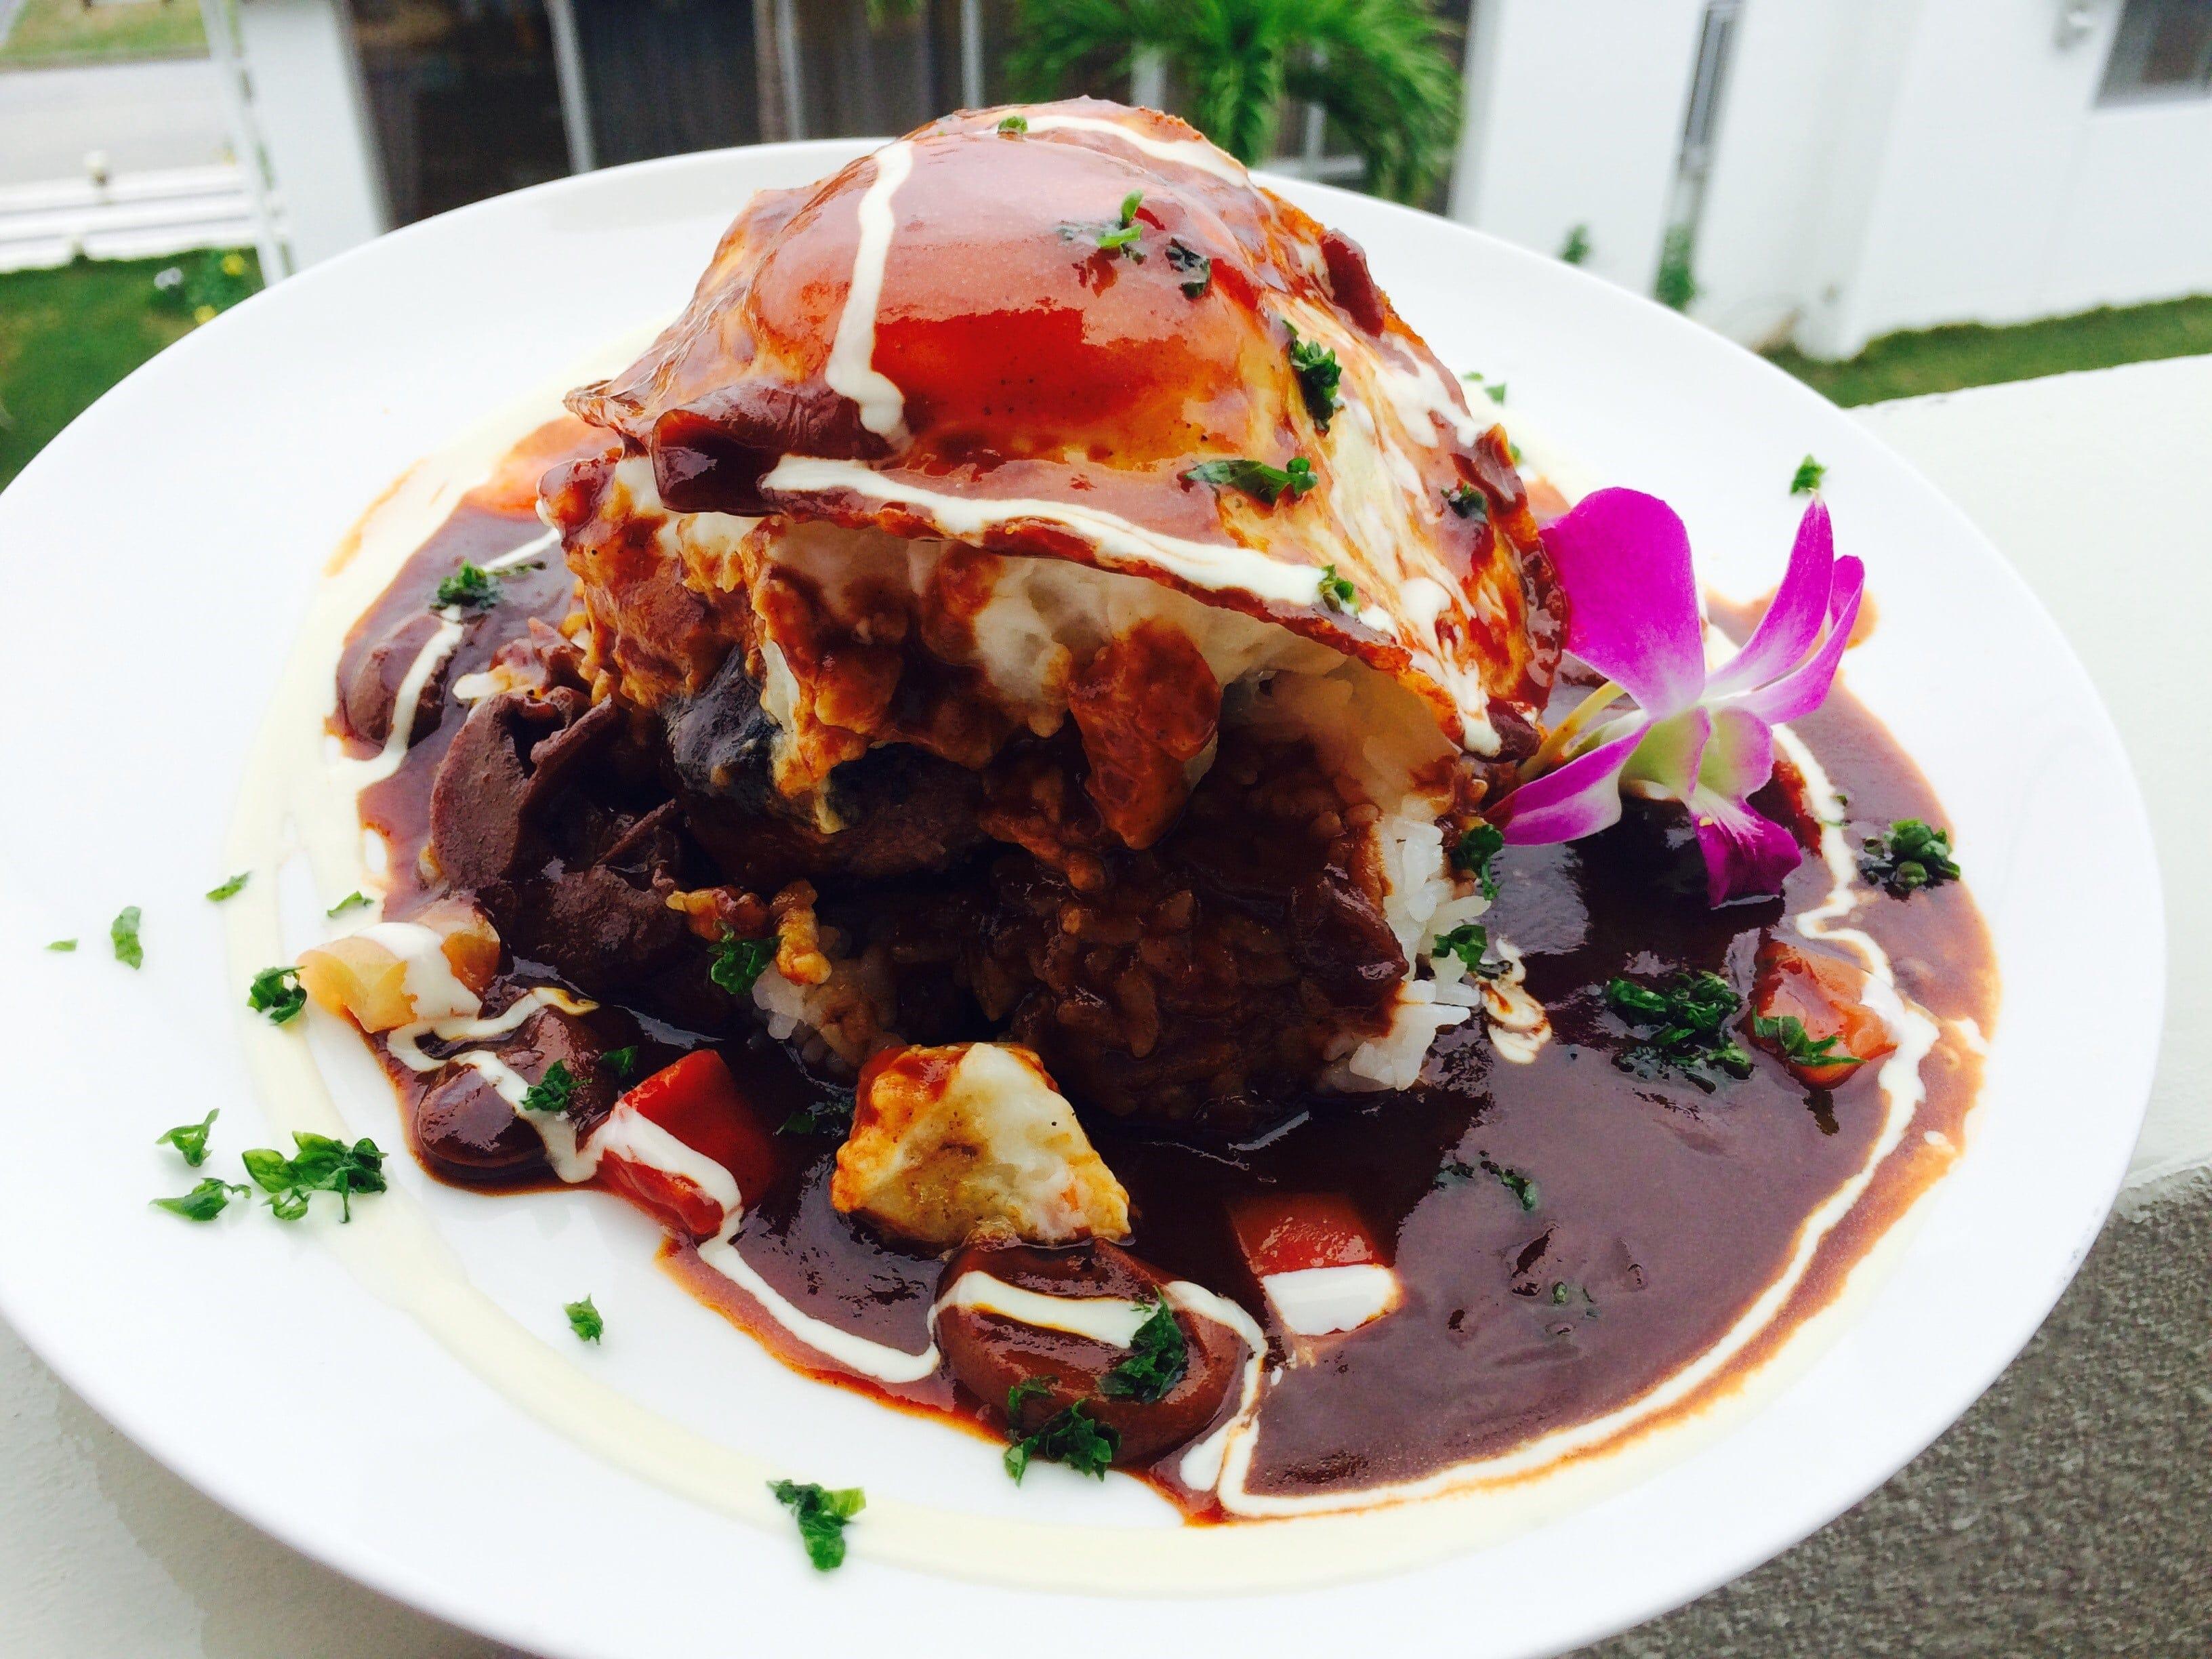 「Hawaiian Cafe Dining KOA」お得なウェブチケット (ロコモコSET&ドリンク通常1860円→1000円)のイメージその1